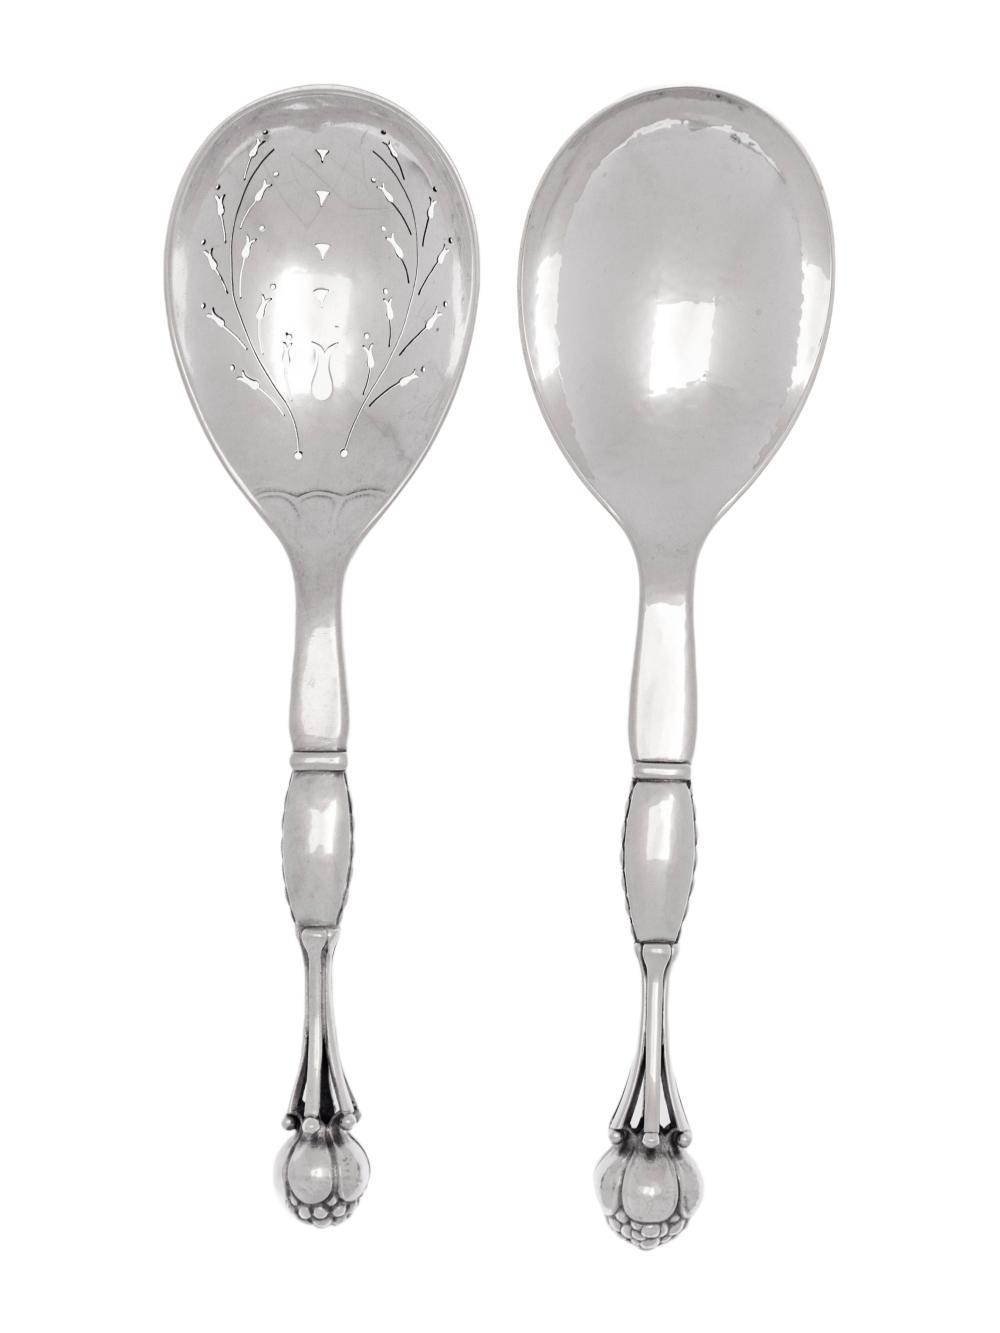 Two Georg Jensen Ornamental Silver Serving Spoons